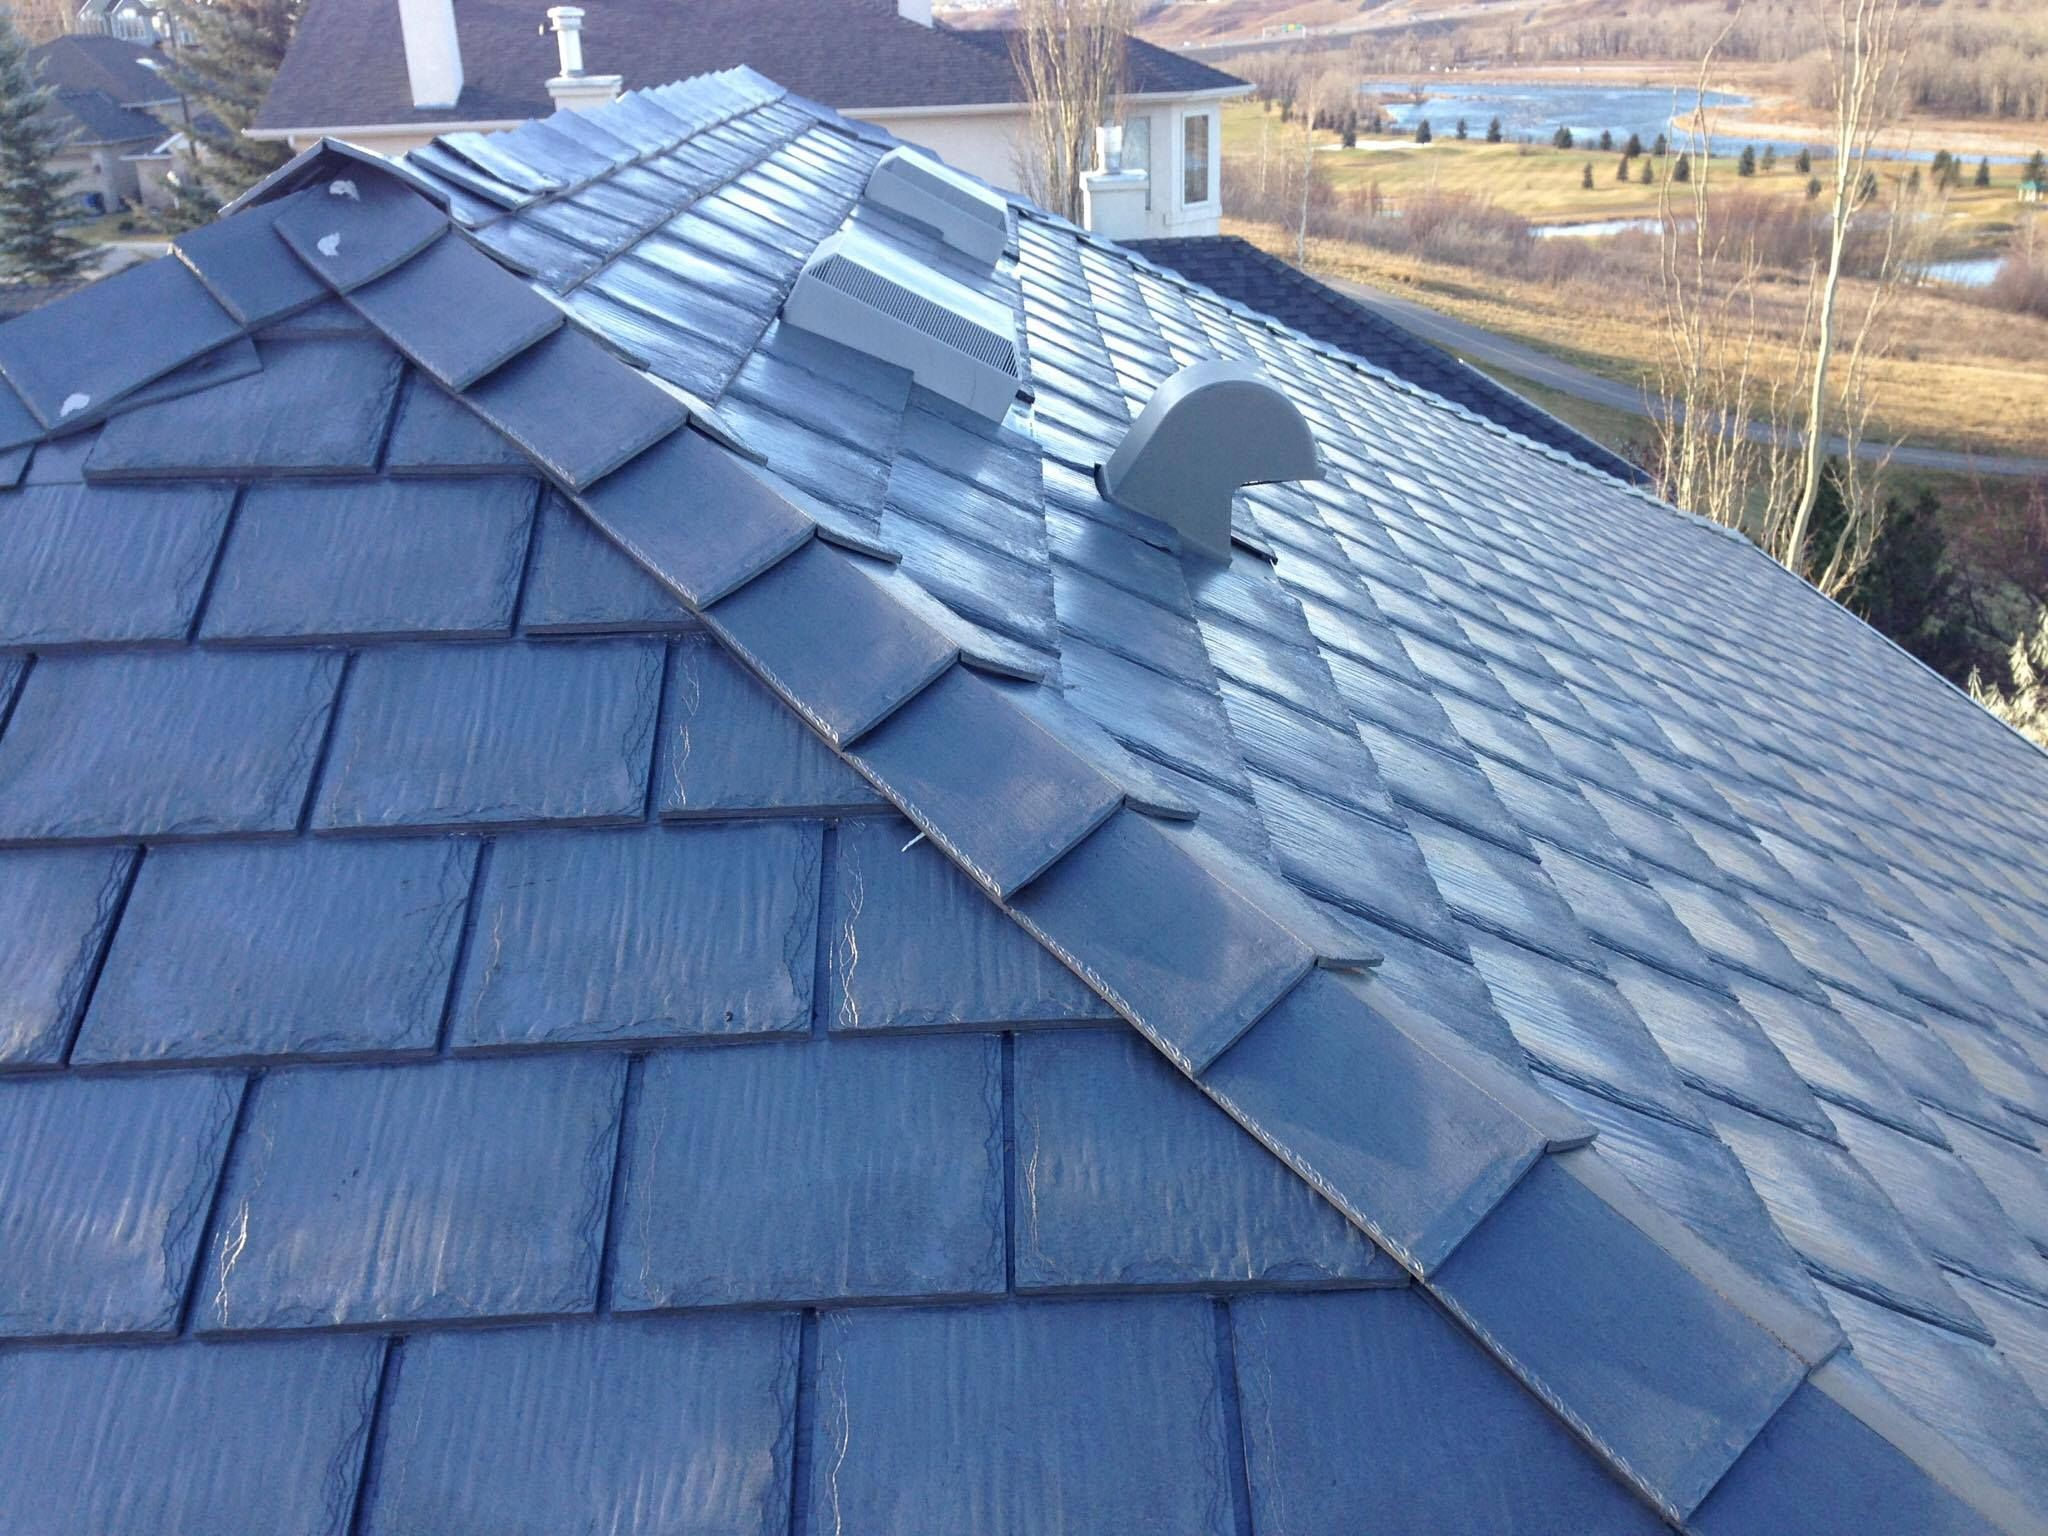 Heritage Slate In Sterling Grey Home Roof Heritage Slate Grey Roofing Roofingmaterial Rubber Rubber Roofing Plastic Roof Tiles Rubber Roofing Material